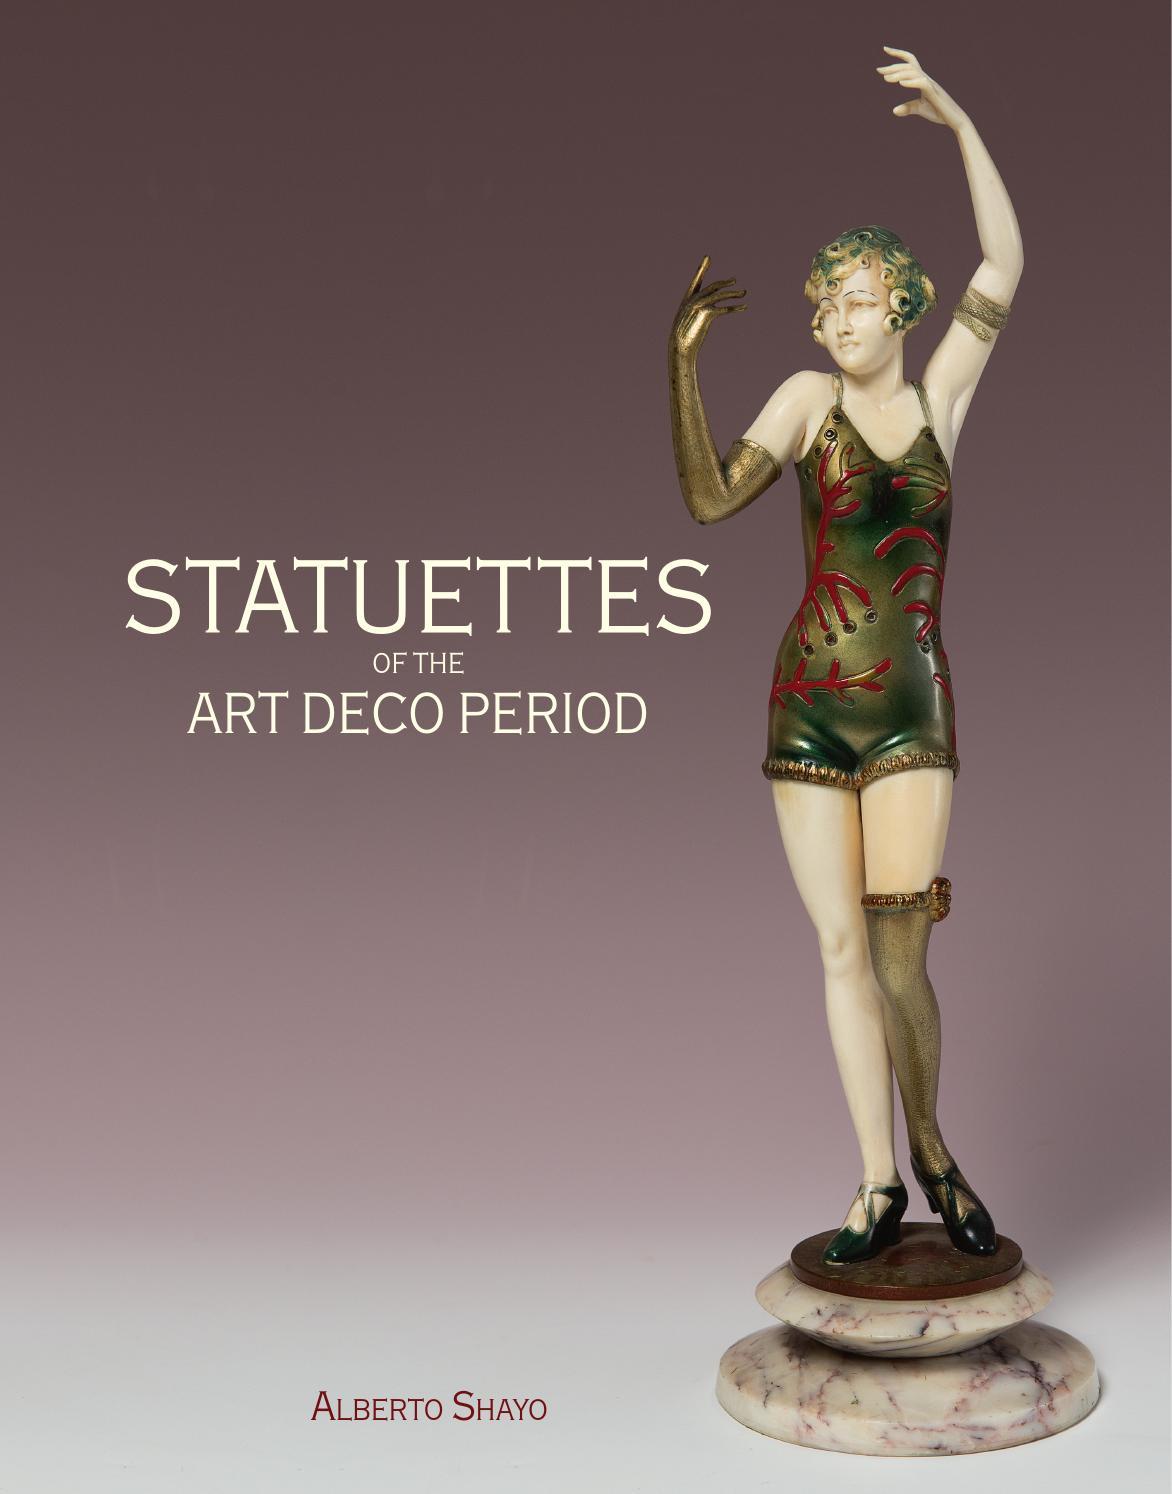 Statuettes art deco period by ACC